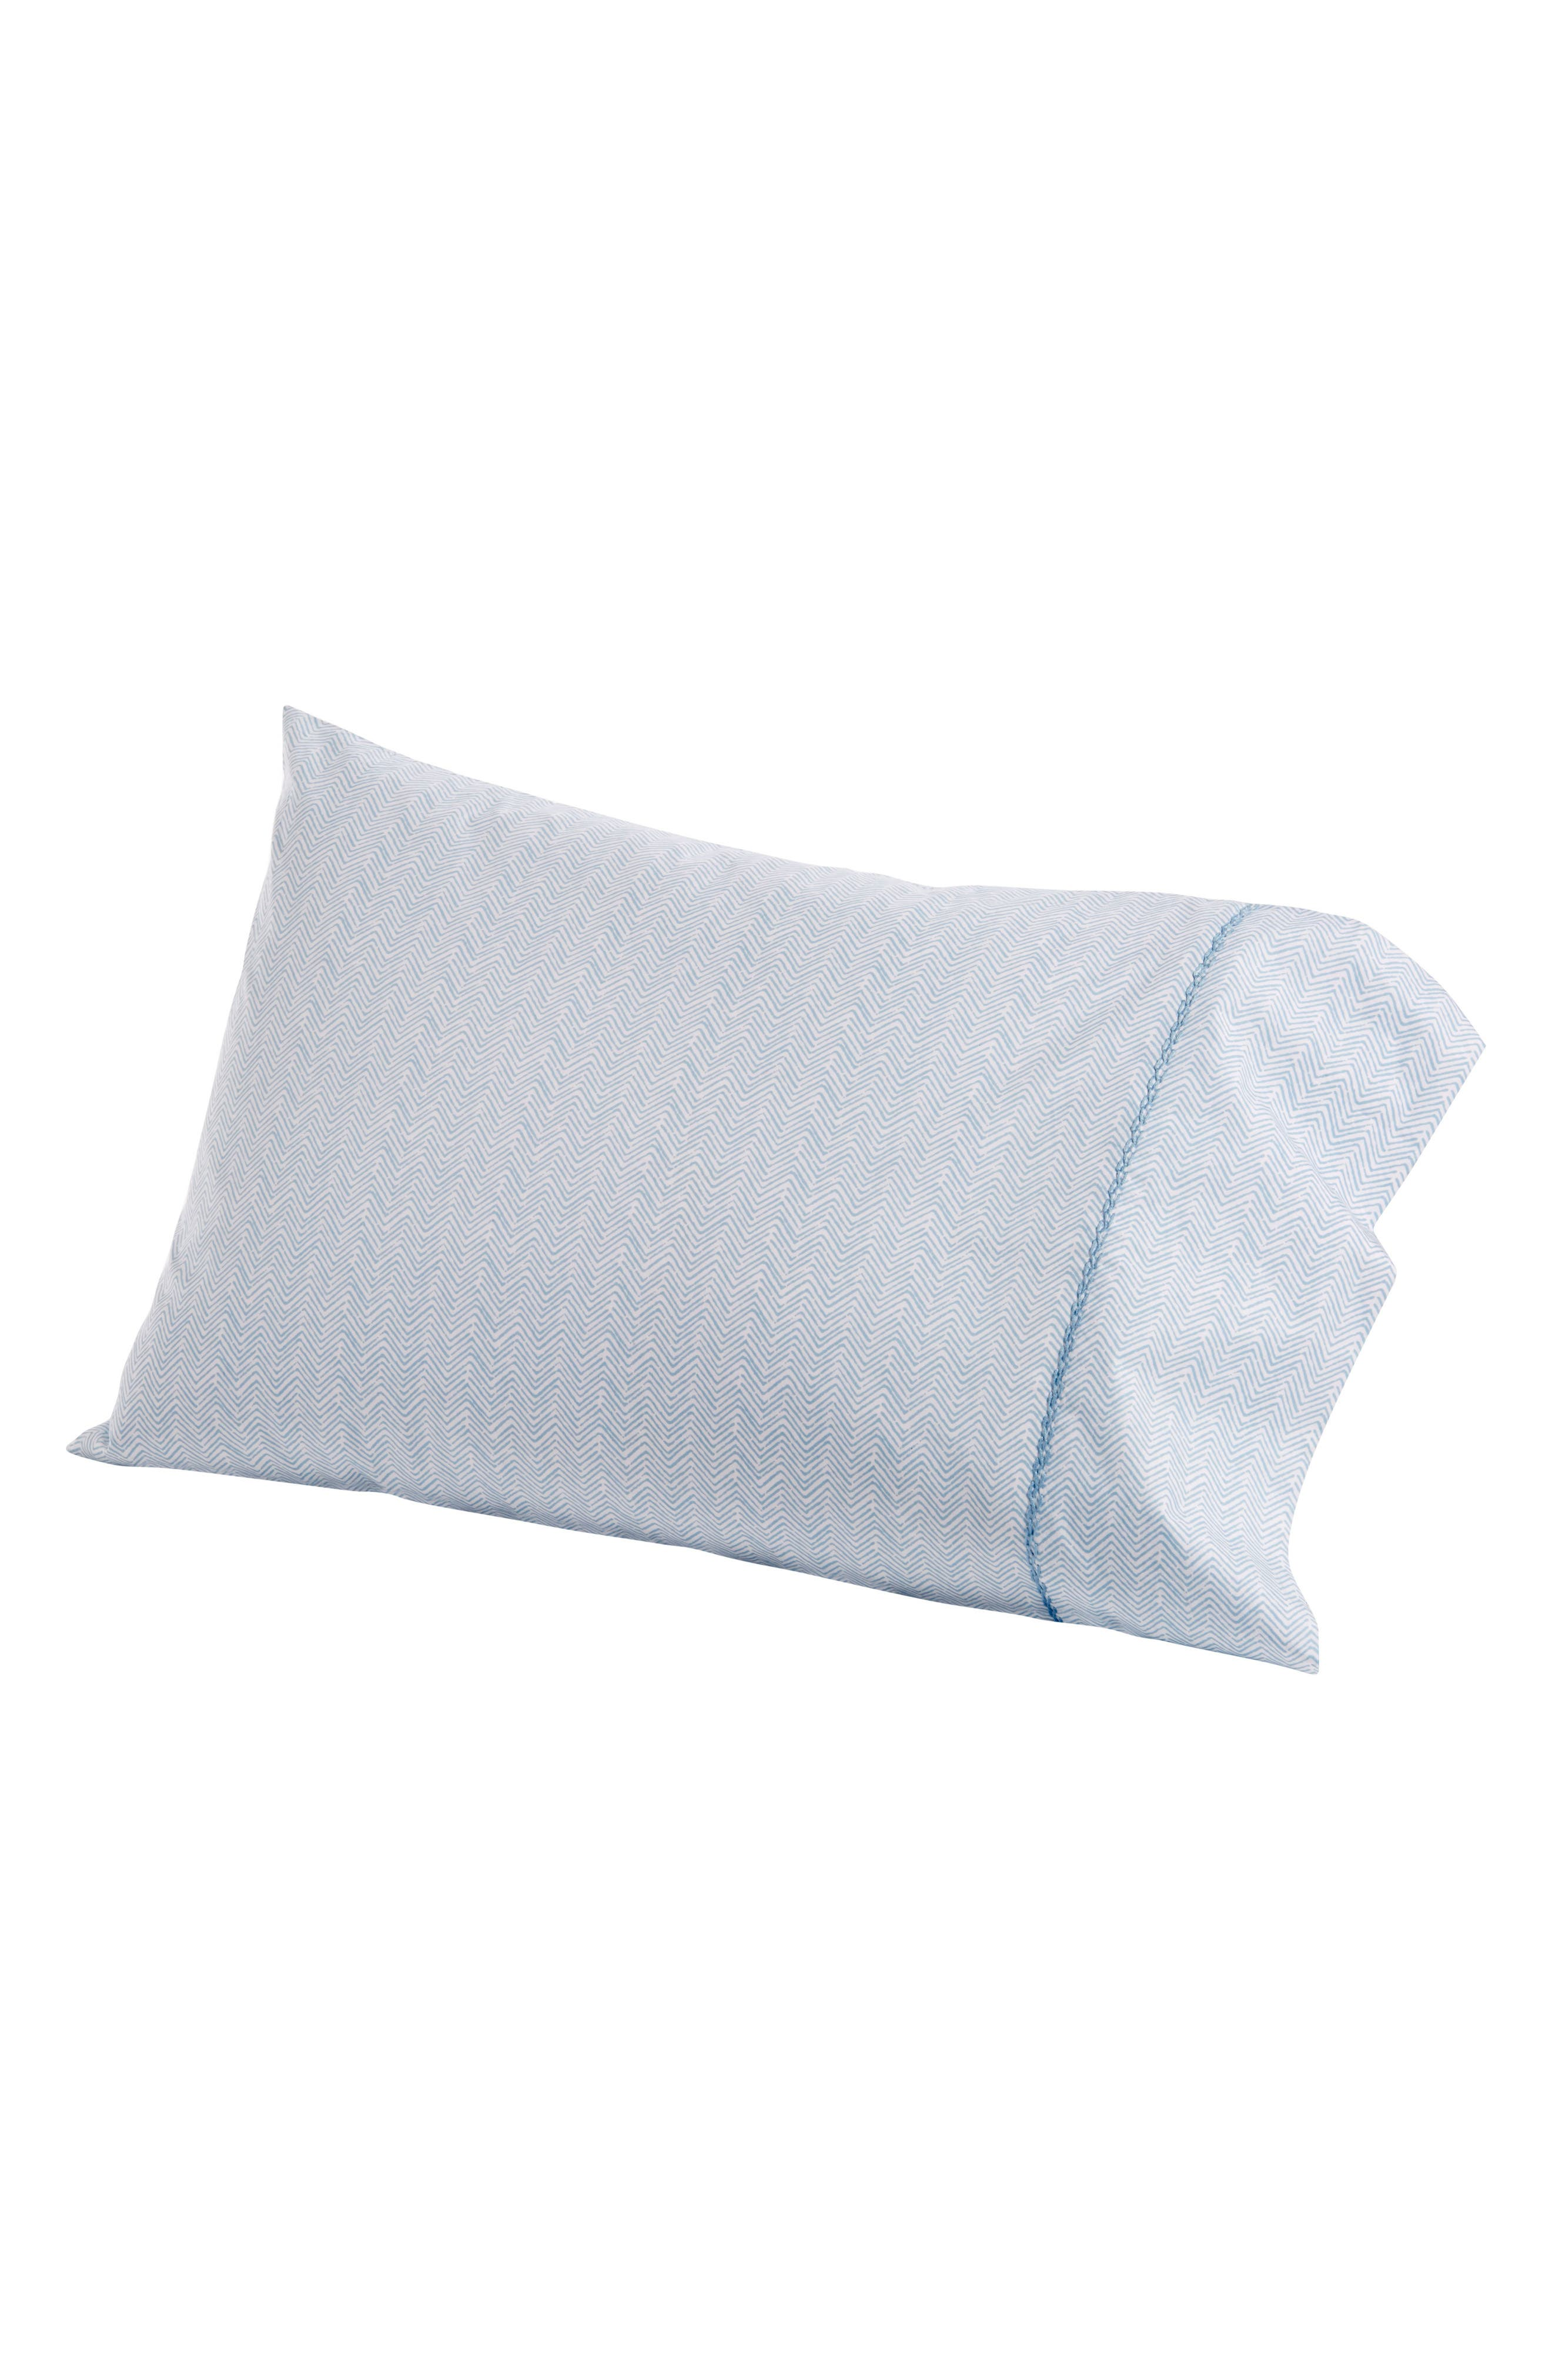 Chevron Combed Cotton Pillowcases,                         Main,                         color, 400